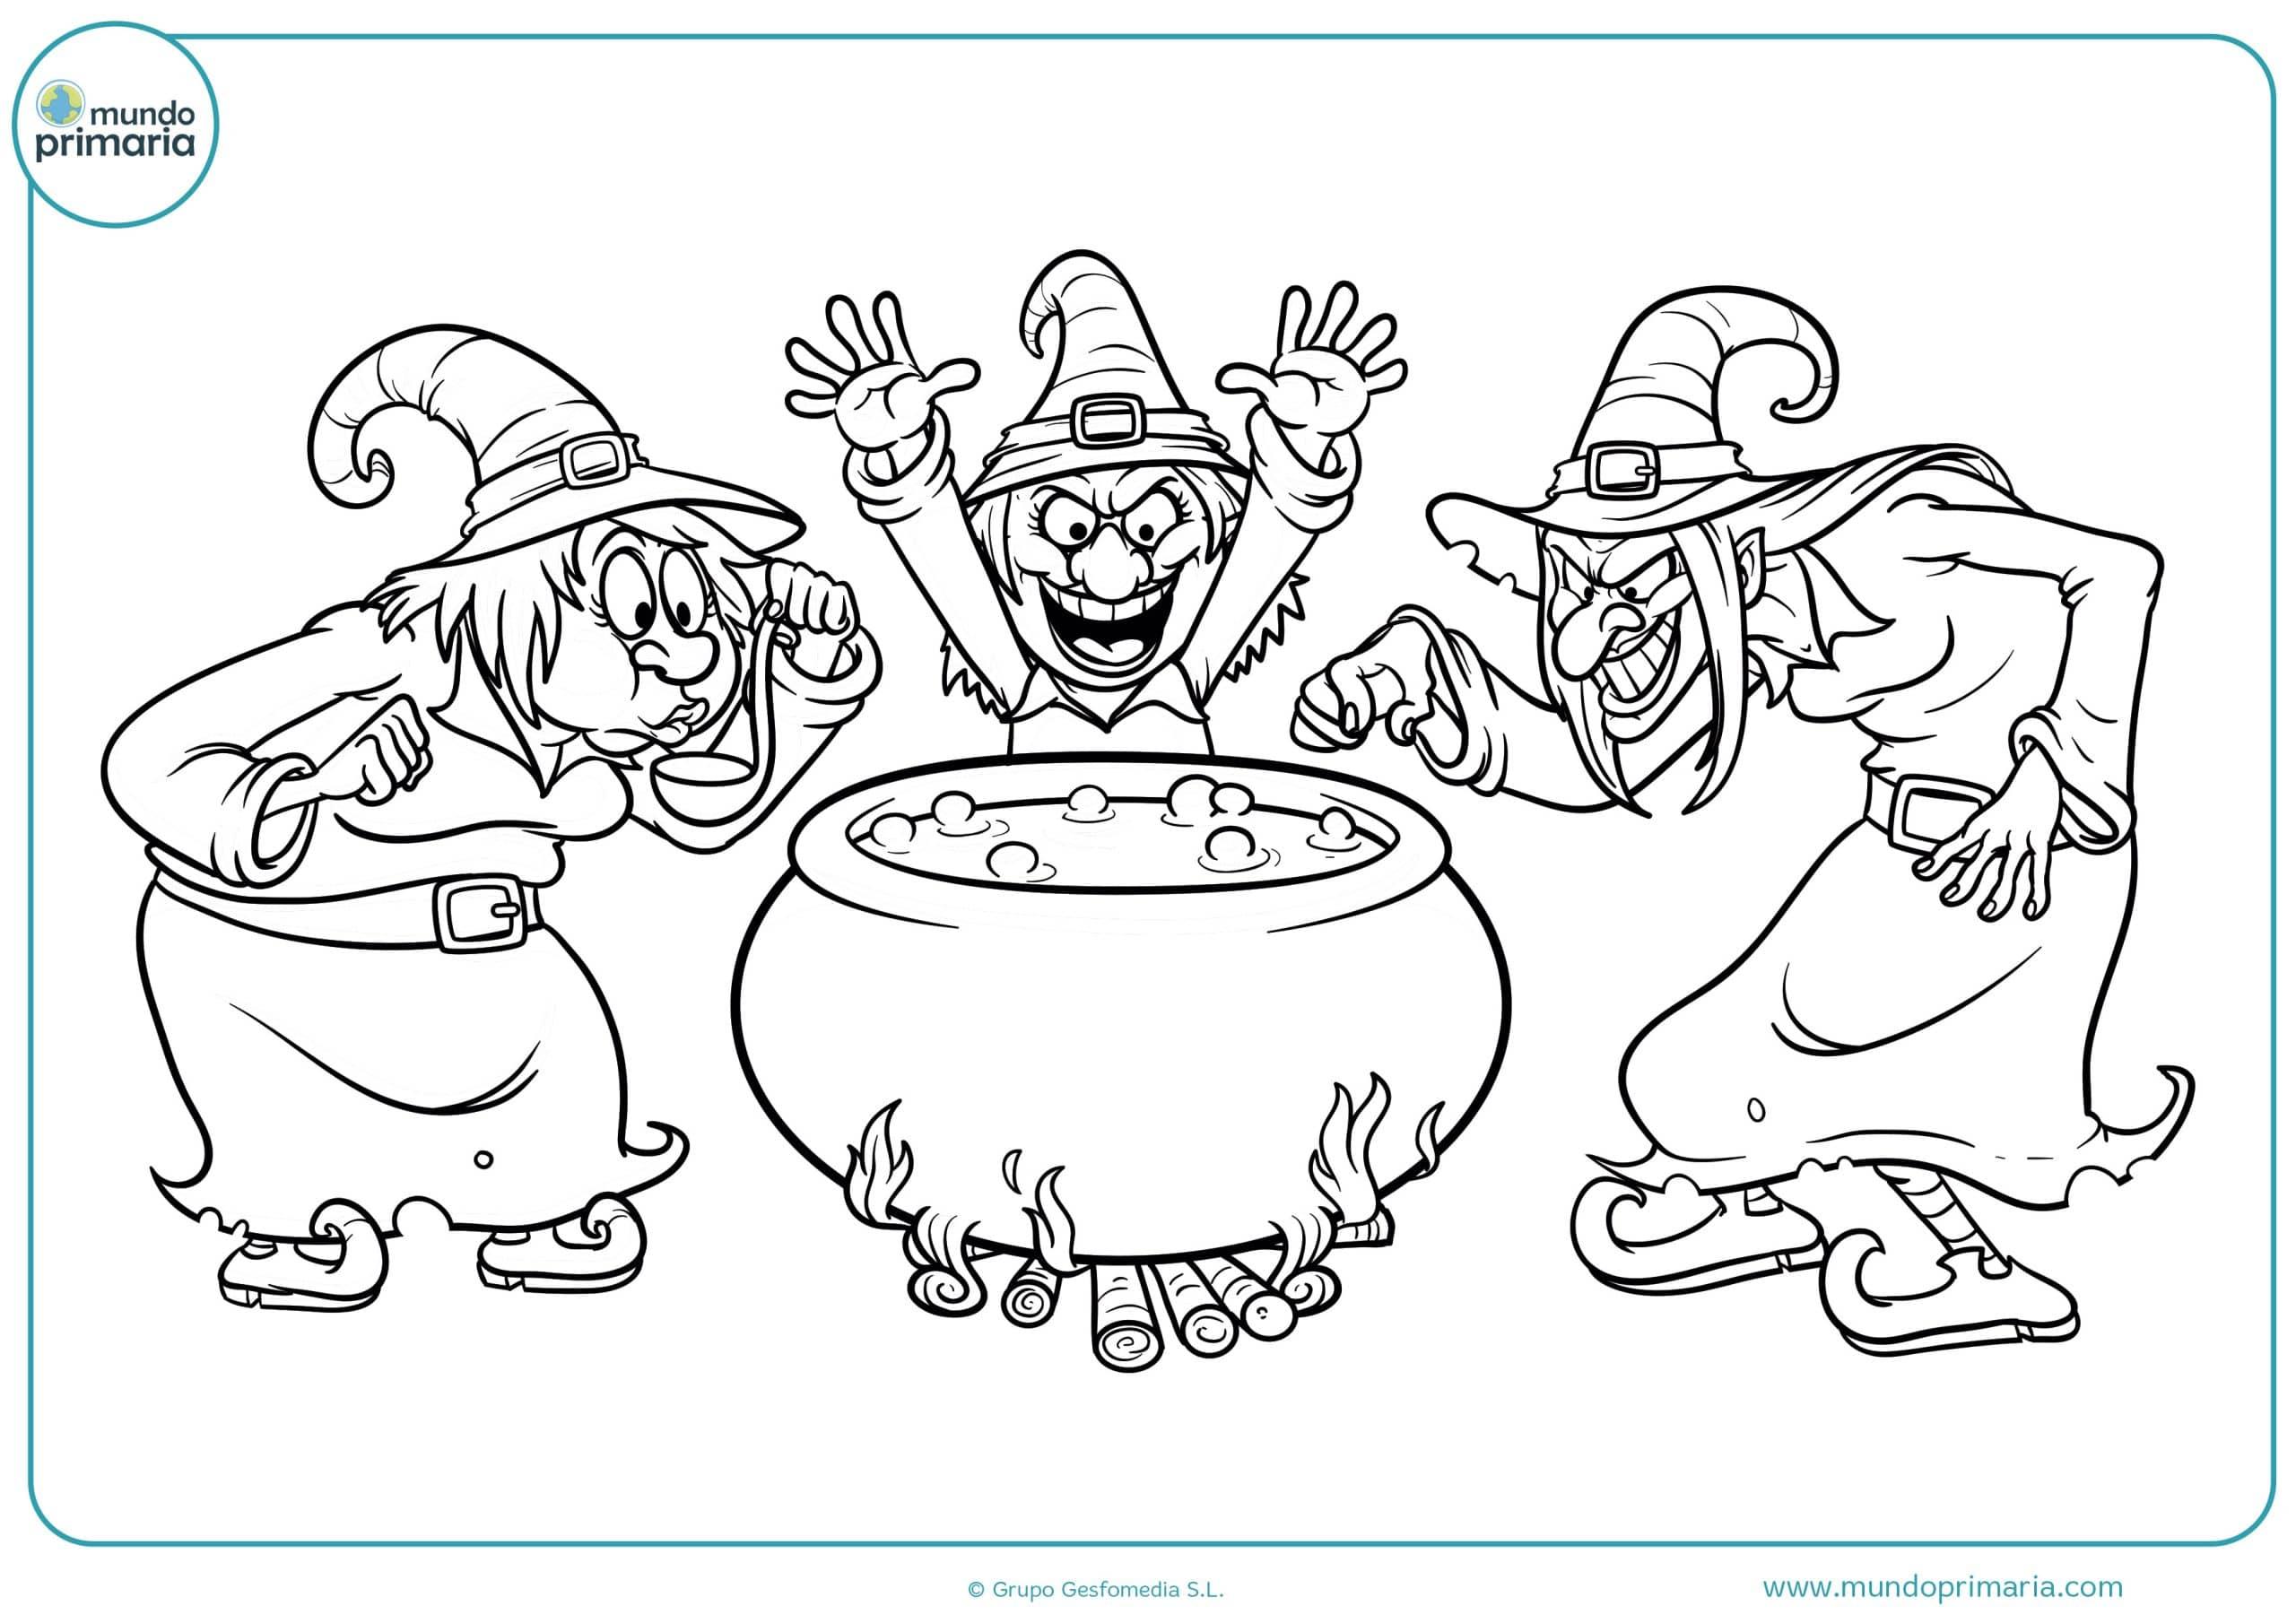 Descargar dibujo Halloween colorear gratis